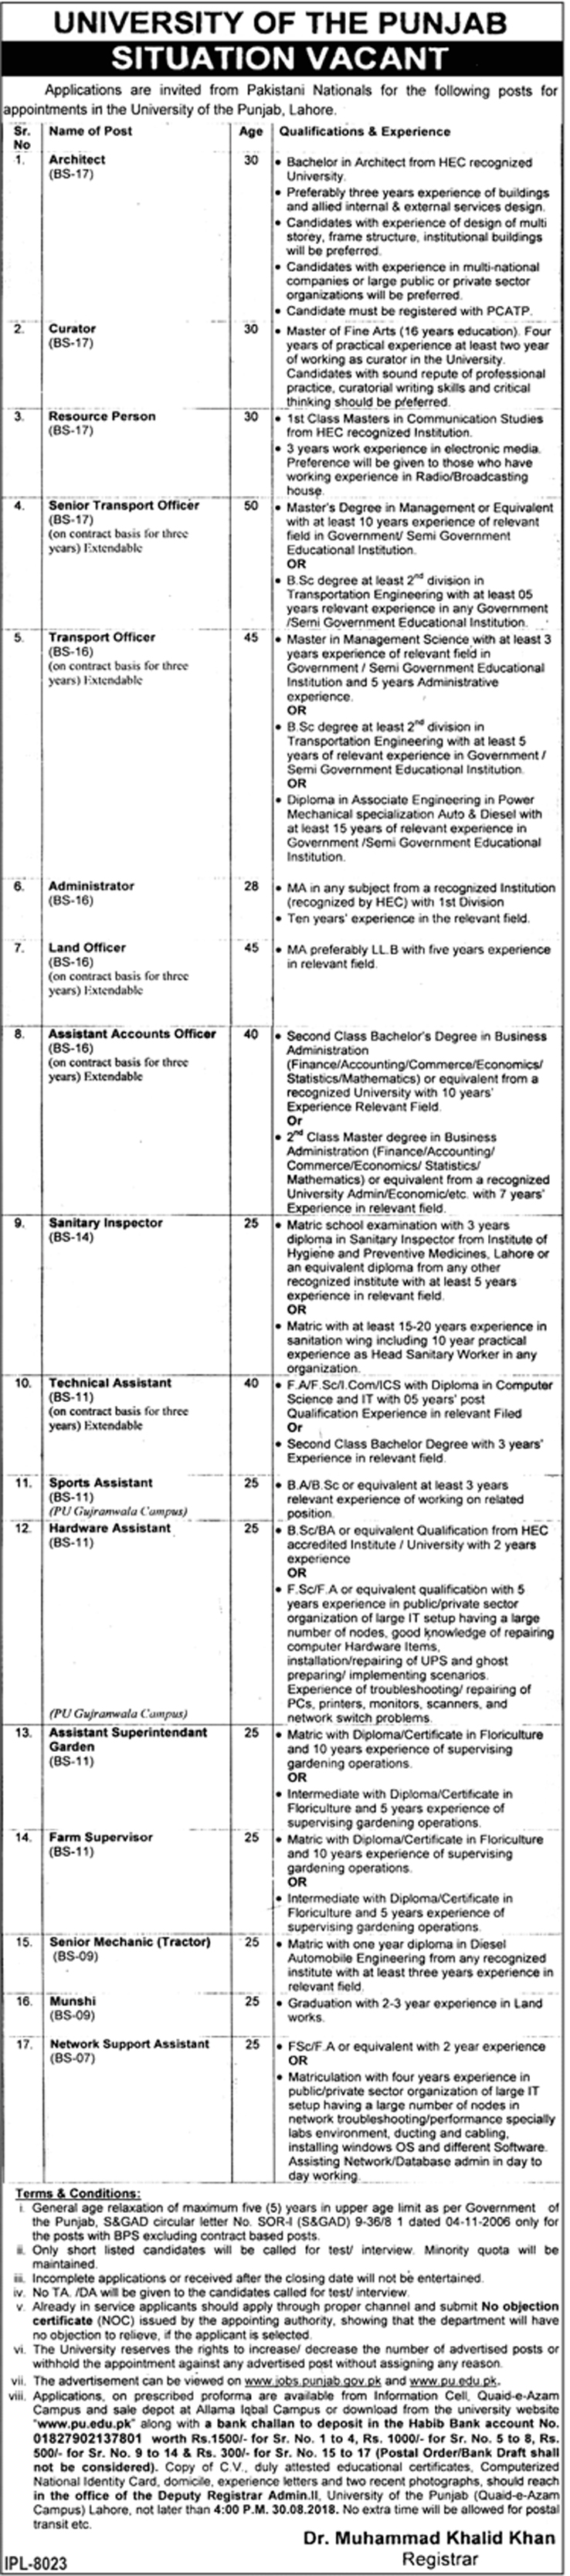 Punjab University Lahore Jobs 2018 August Advertisement www.pu.edu.pk